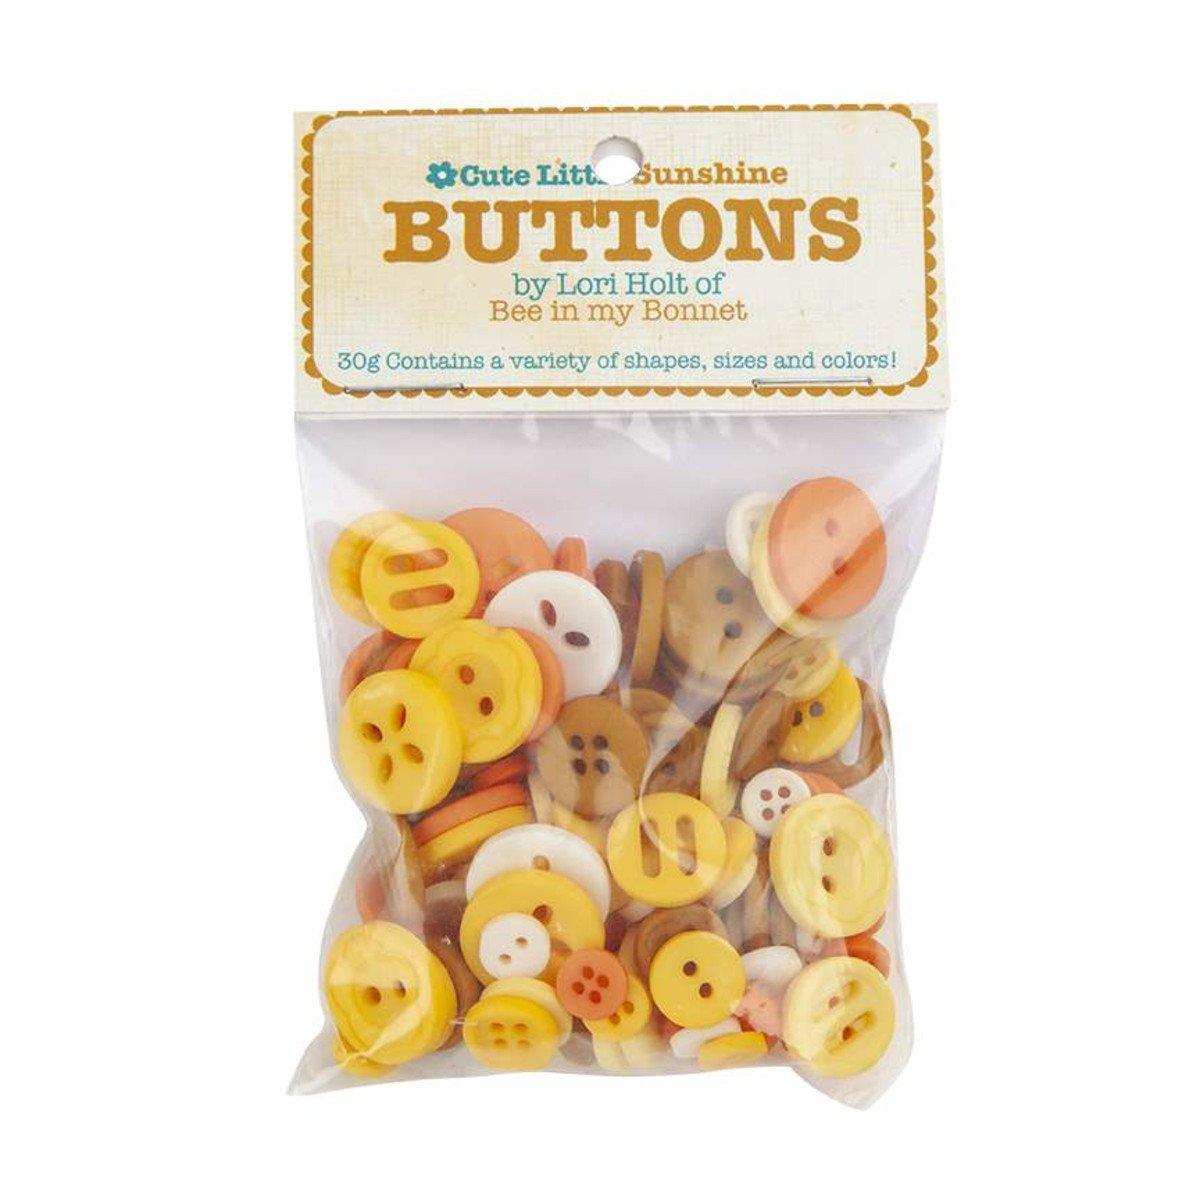 Cute Little Buttons Sunshine by Lori Holt